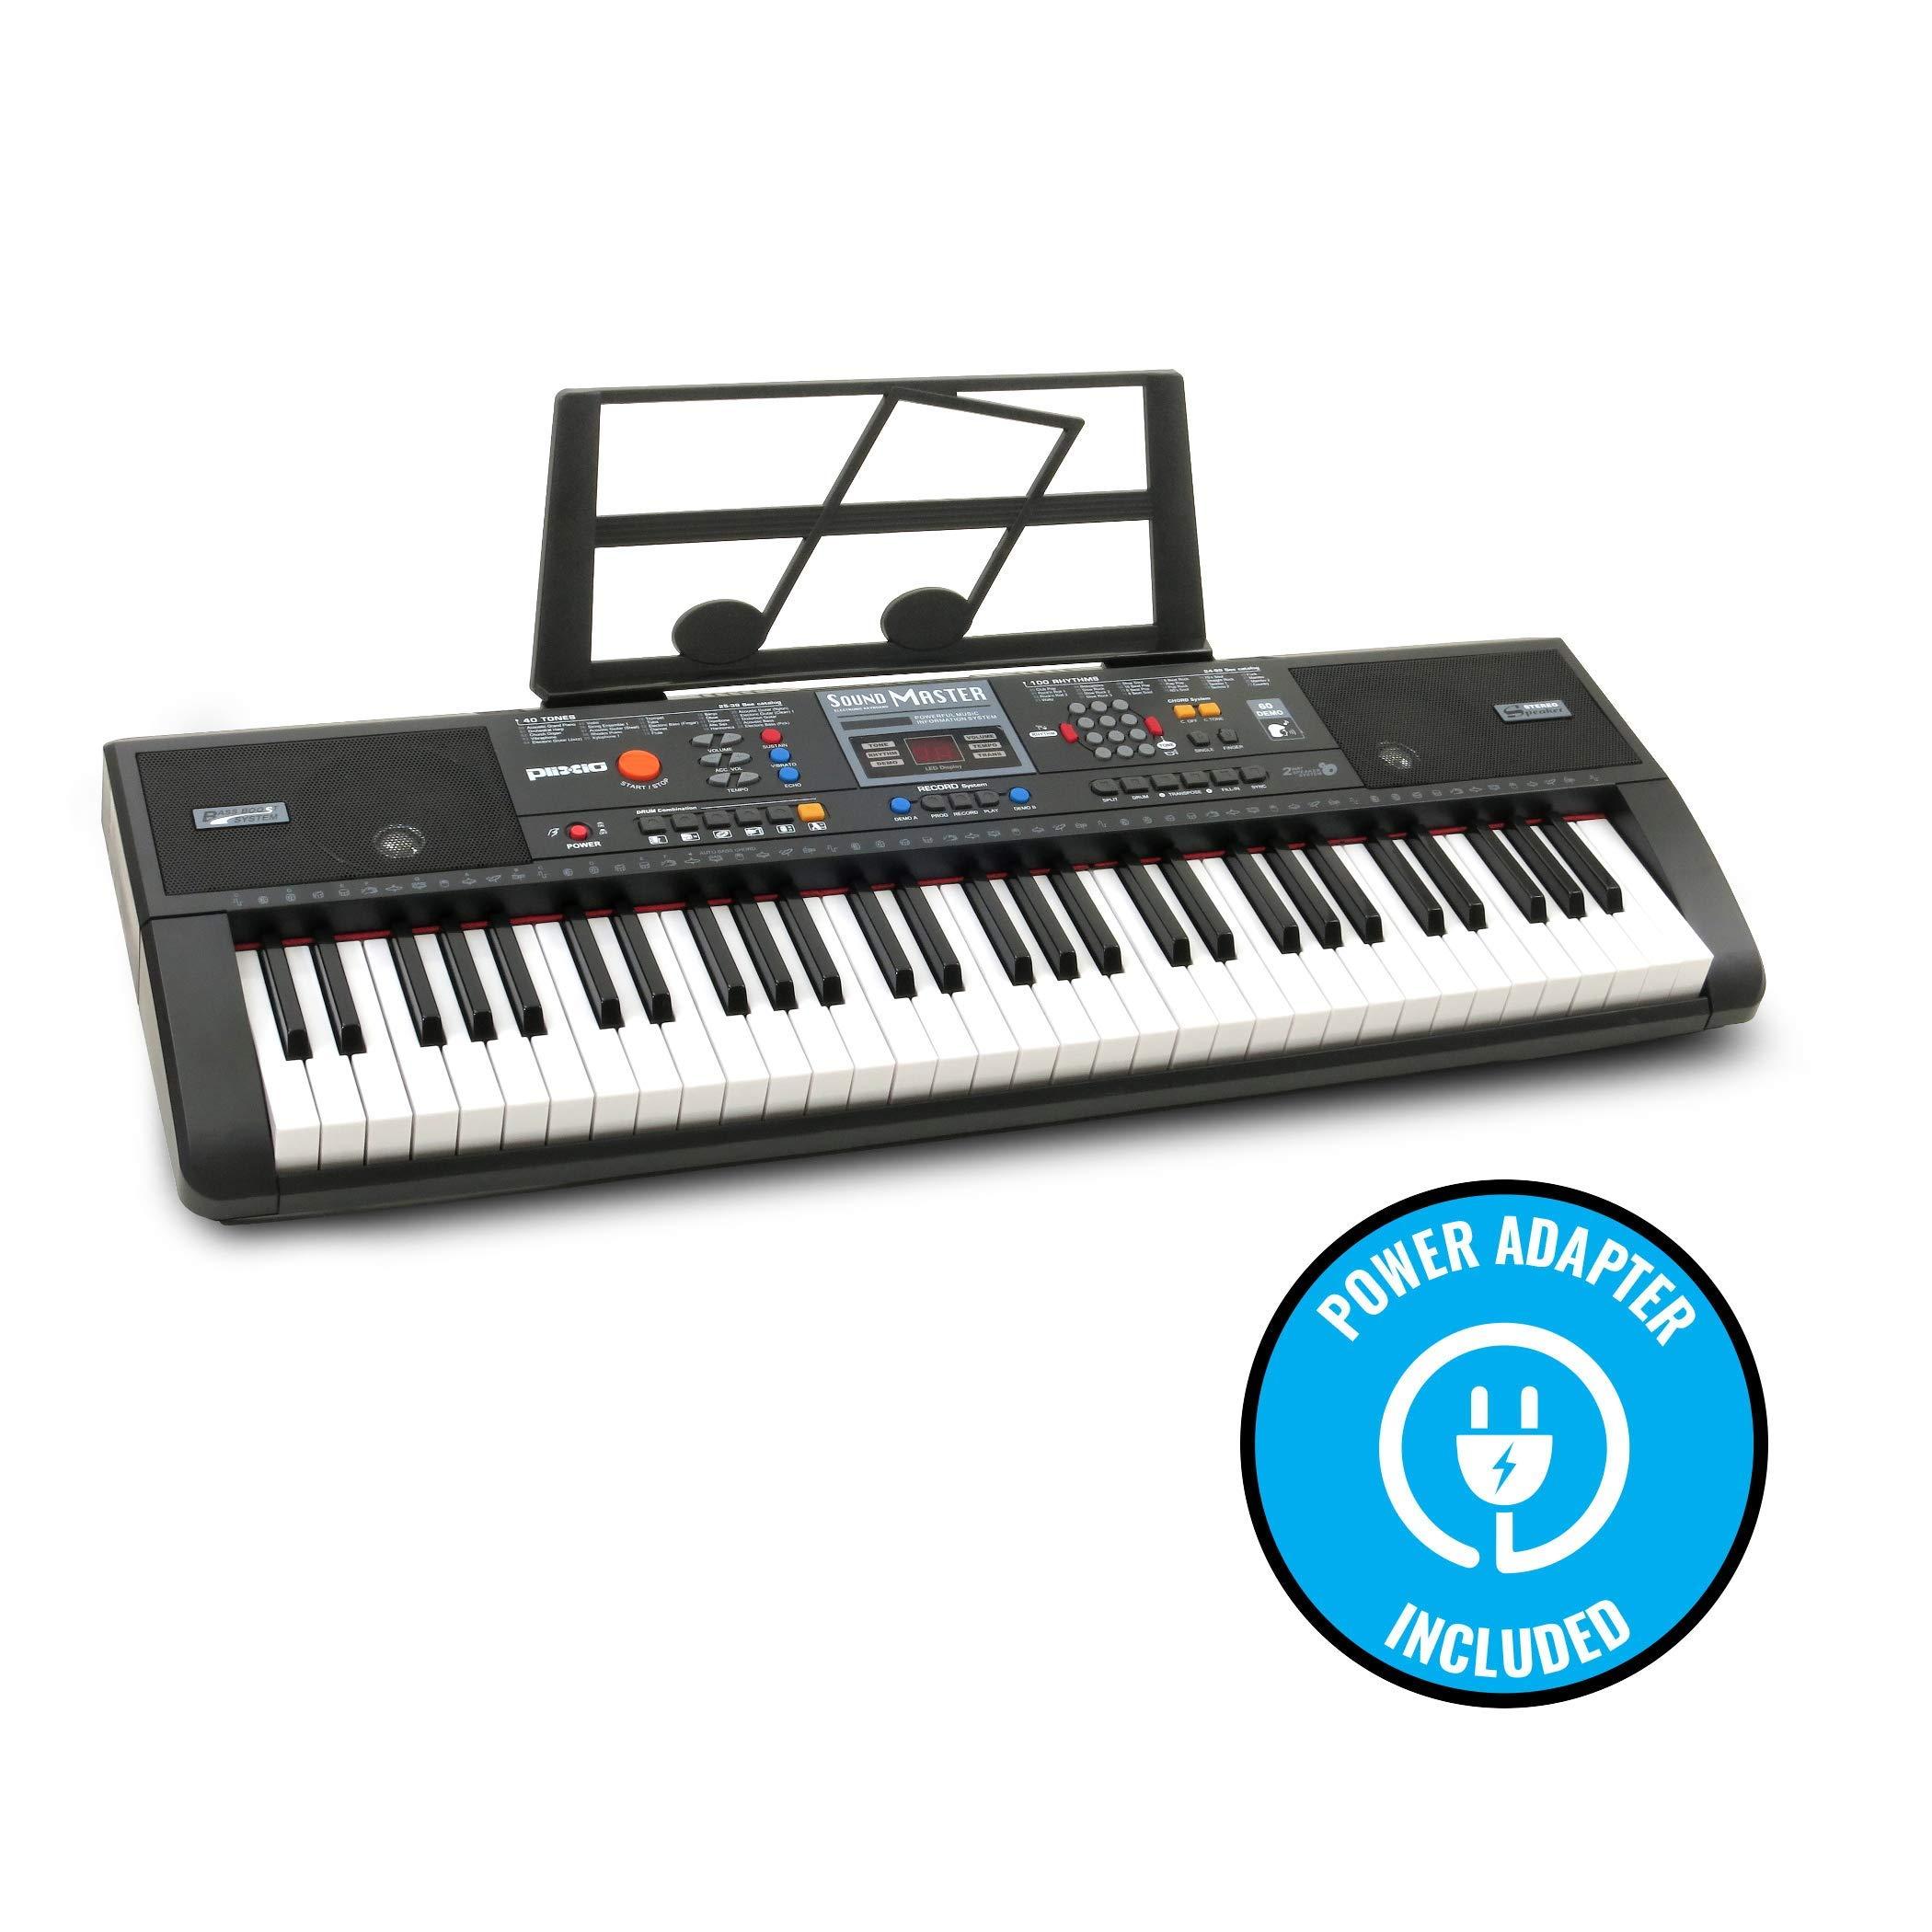 Plixio 61-Key Digital Electric Piano Keyboard & Sheet Music Stand - Portable Electronic Keyboard for Beginners (Kids & Adults) (Renewed) by Plixio (Image #5)